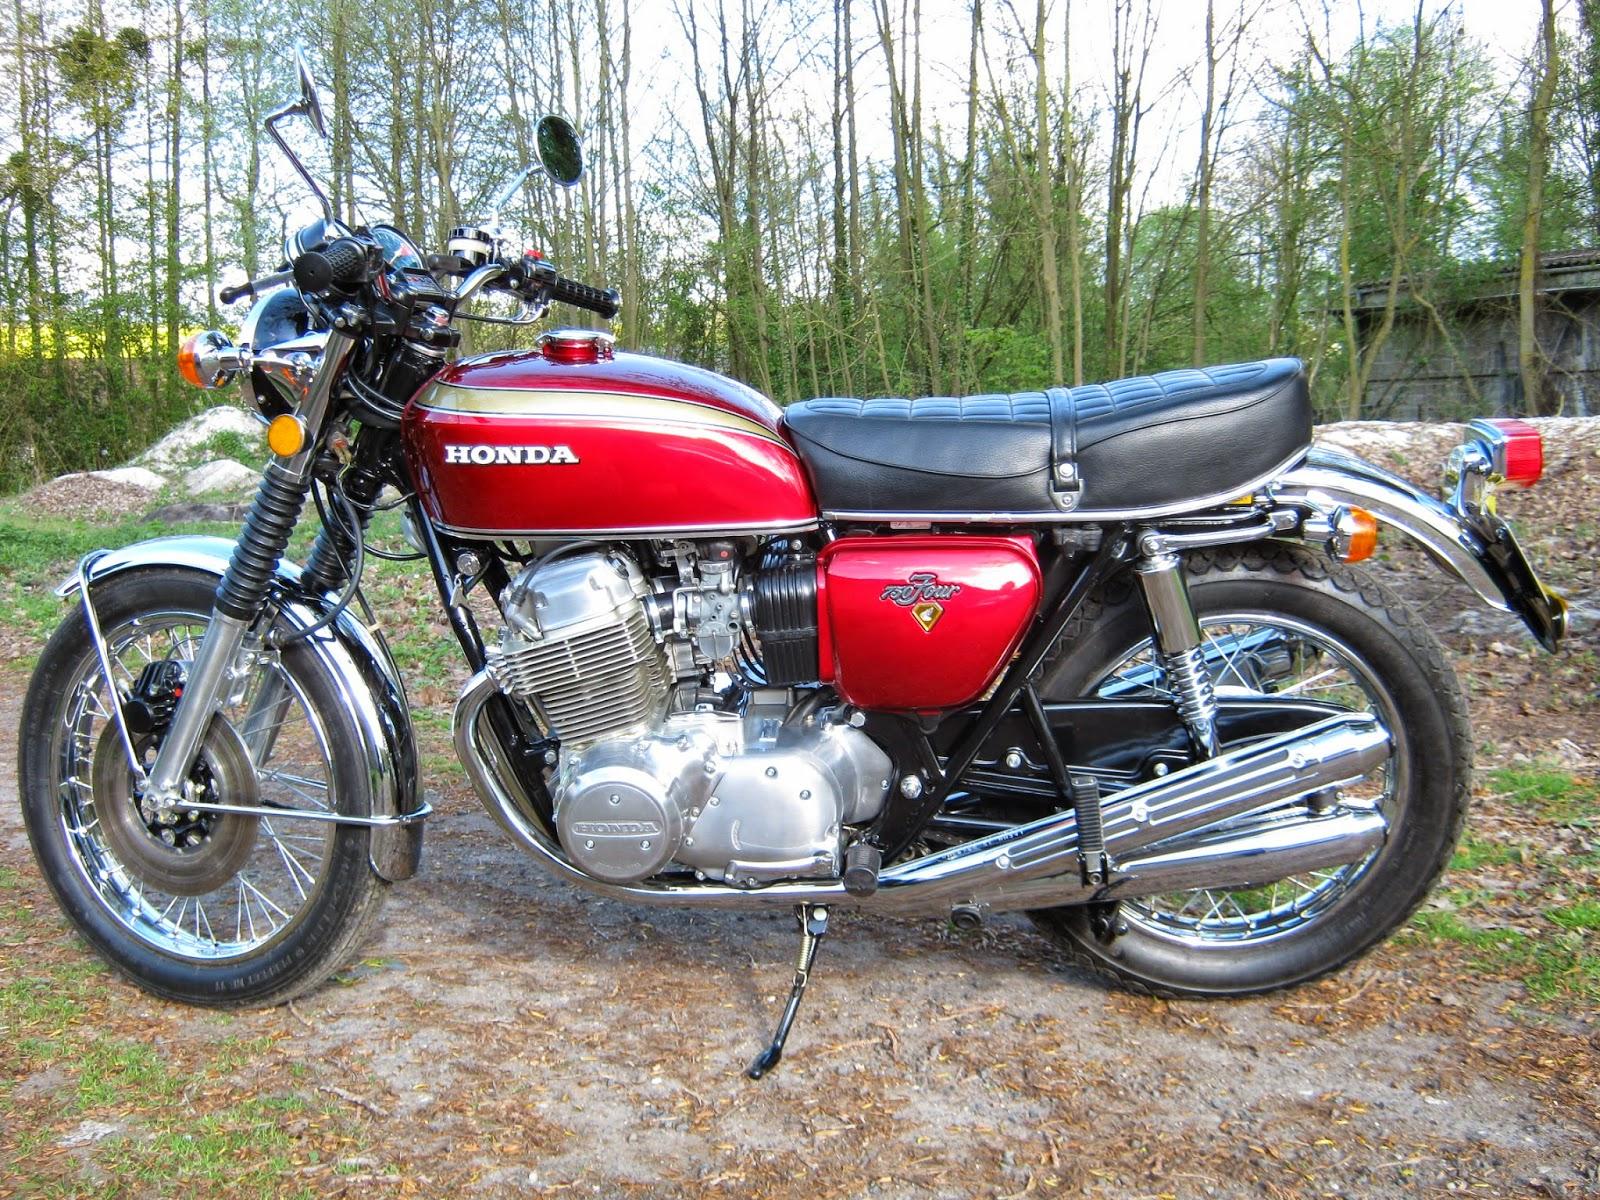 croco deco moto honda 750 four k2 1972 candy rouge. Black Bedroom Furniture Sets. Home Design Ideas